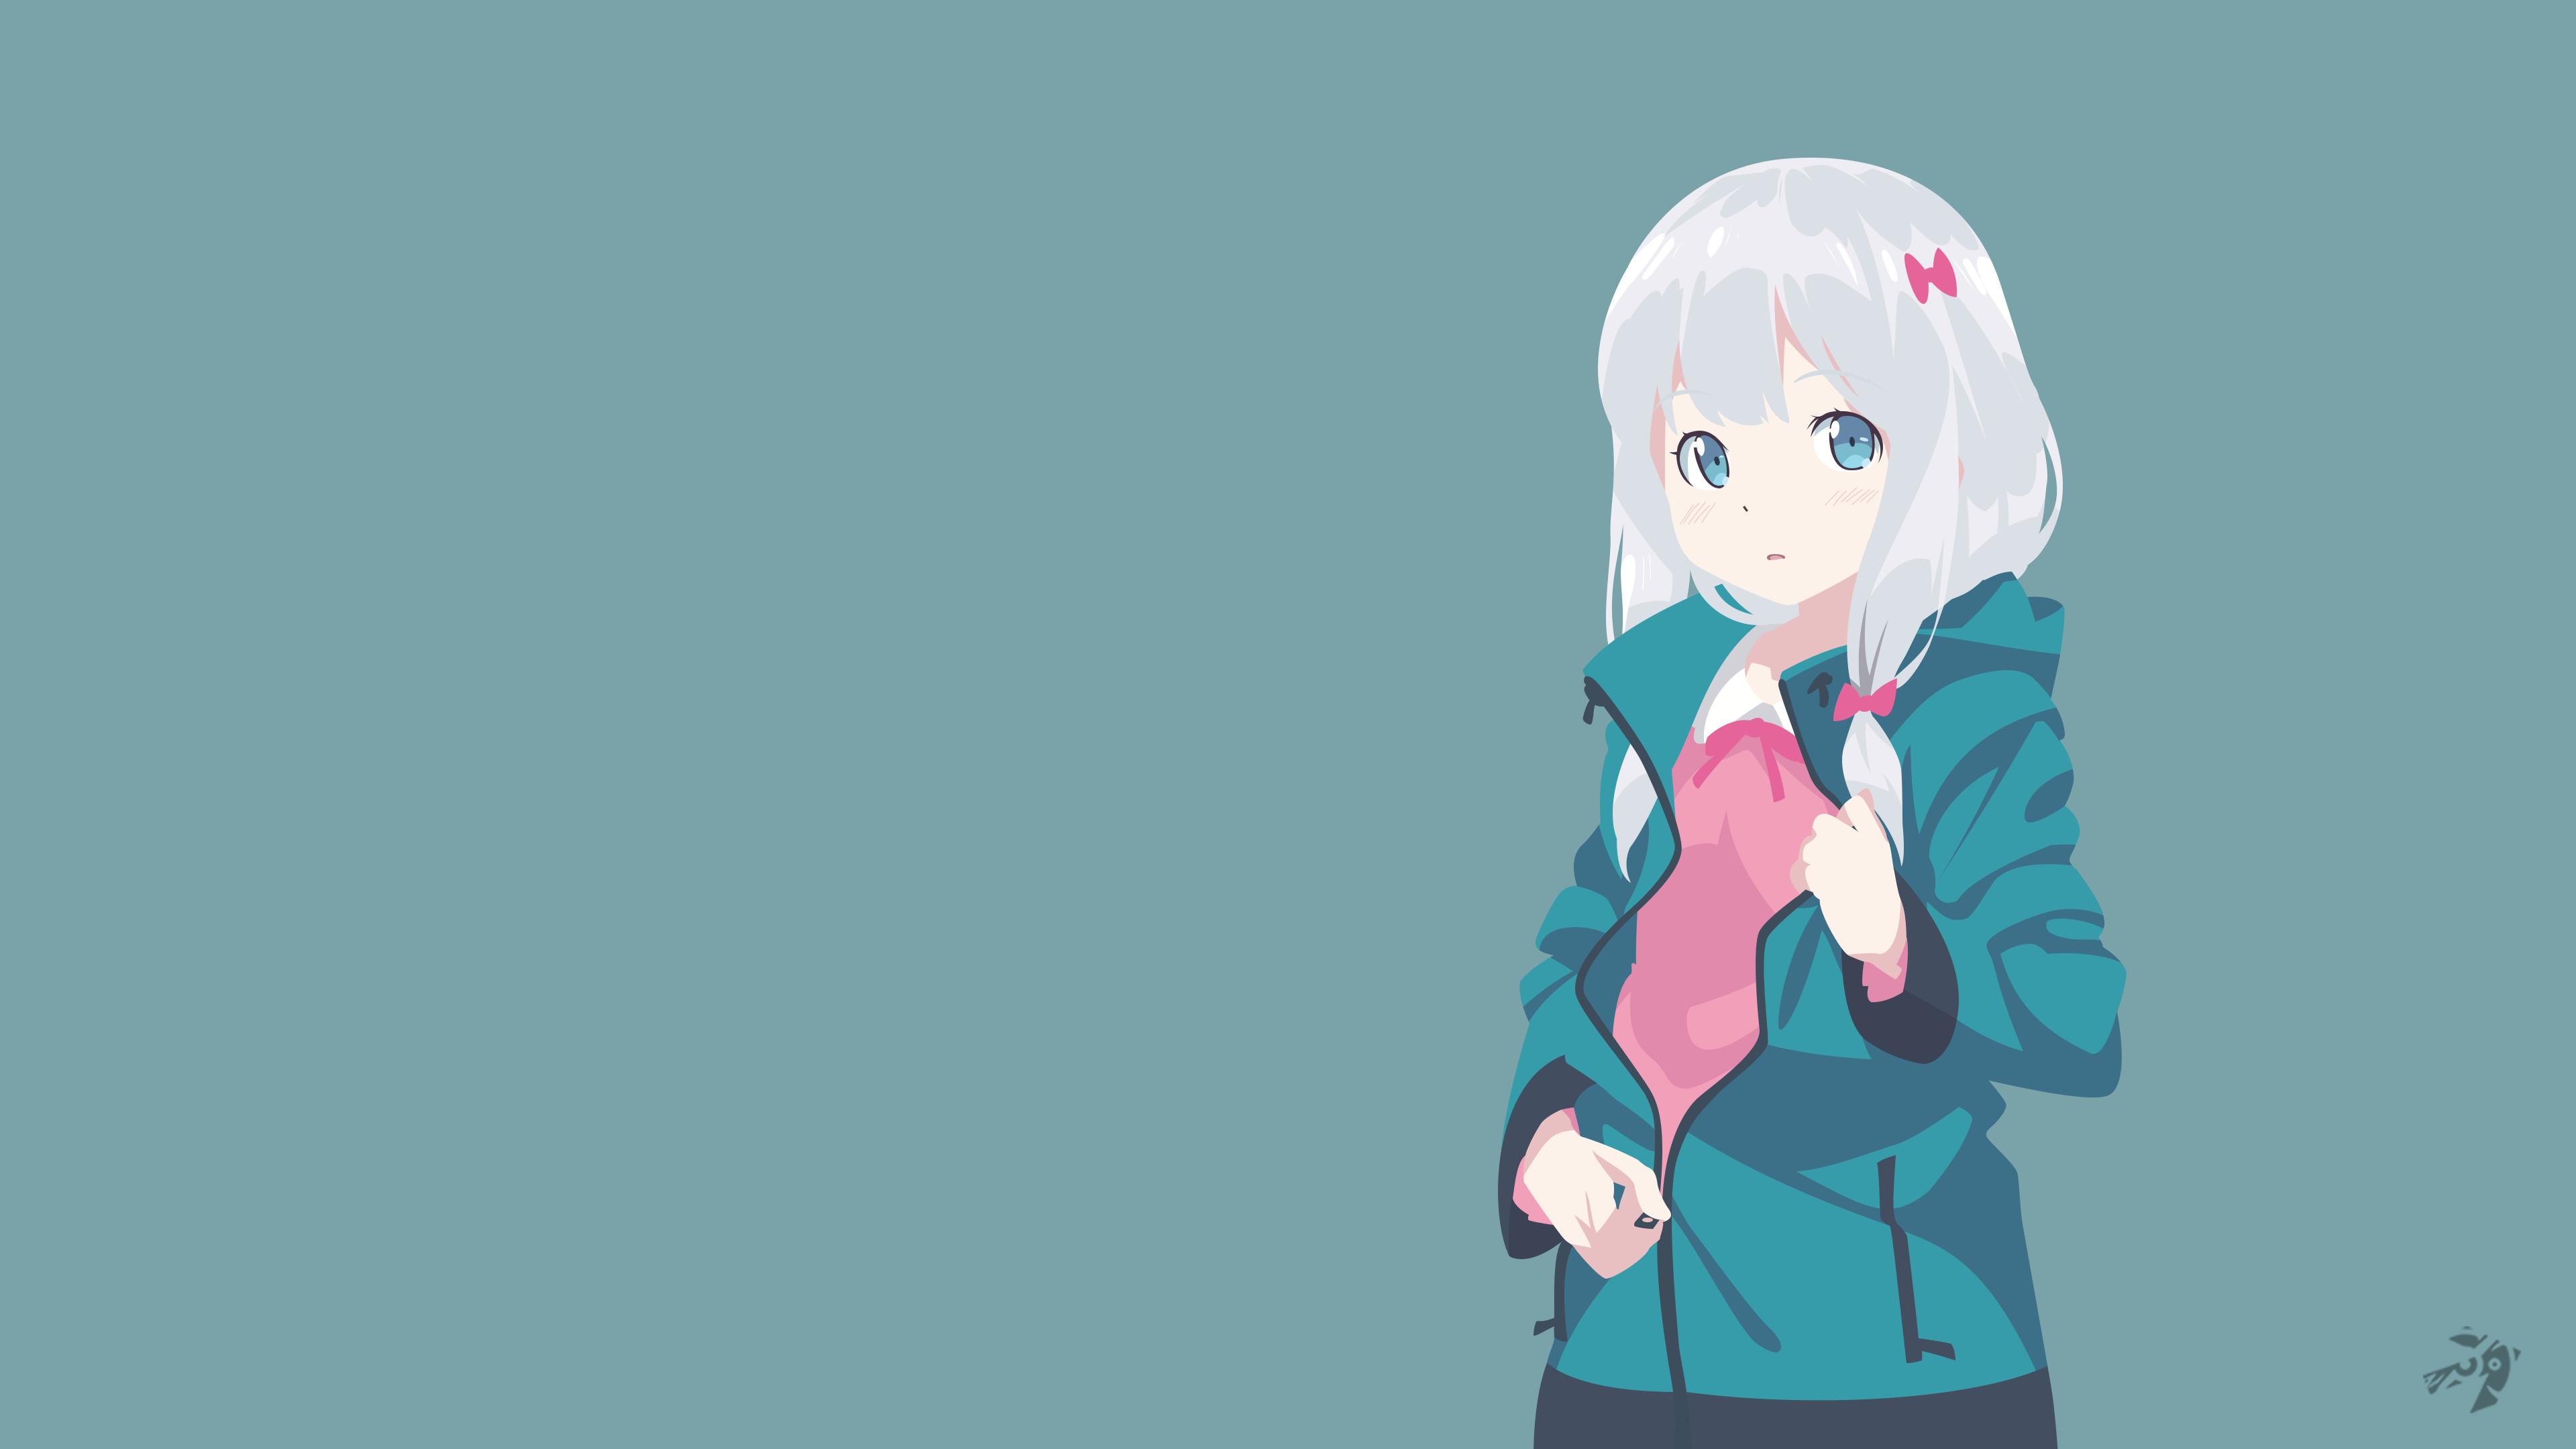 … Sagiri Izumi V2 | Eromanga Sensei Minimalist Anime by Lucifer012